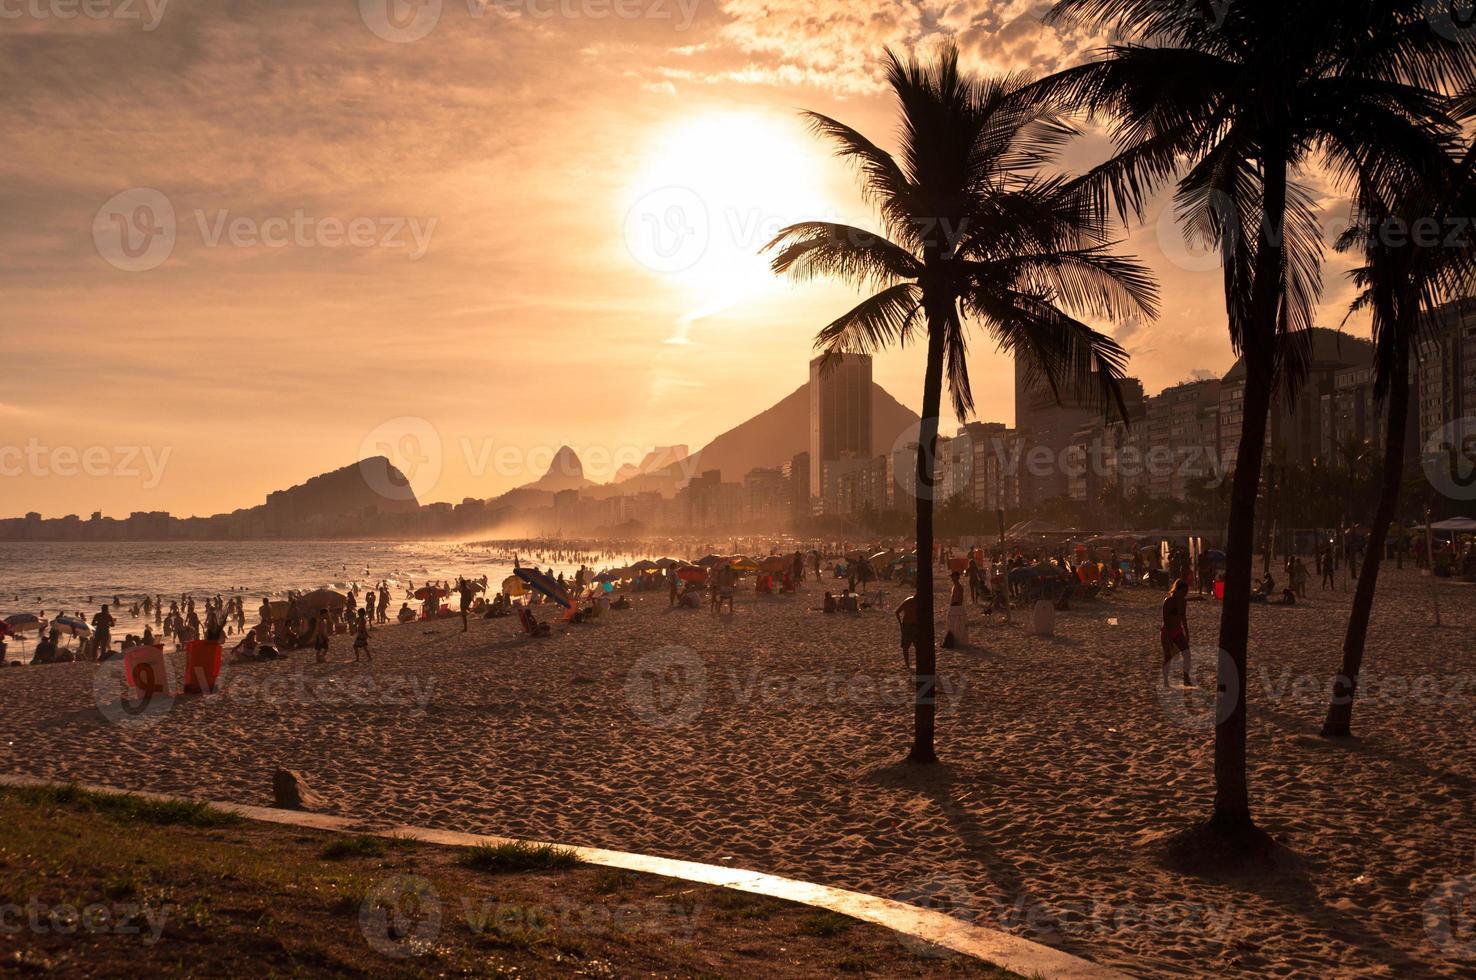 praia de copacabana ao pôr do sol foto